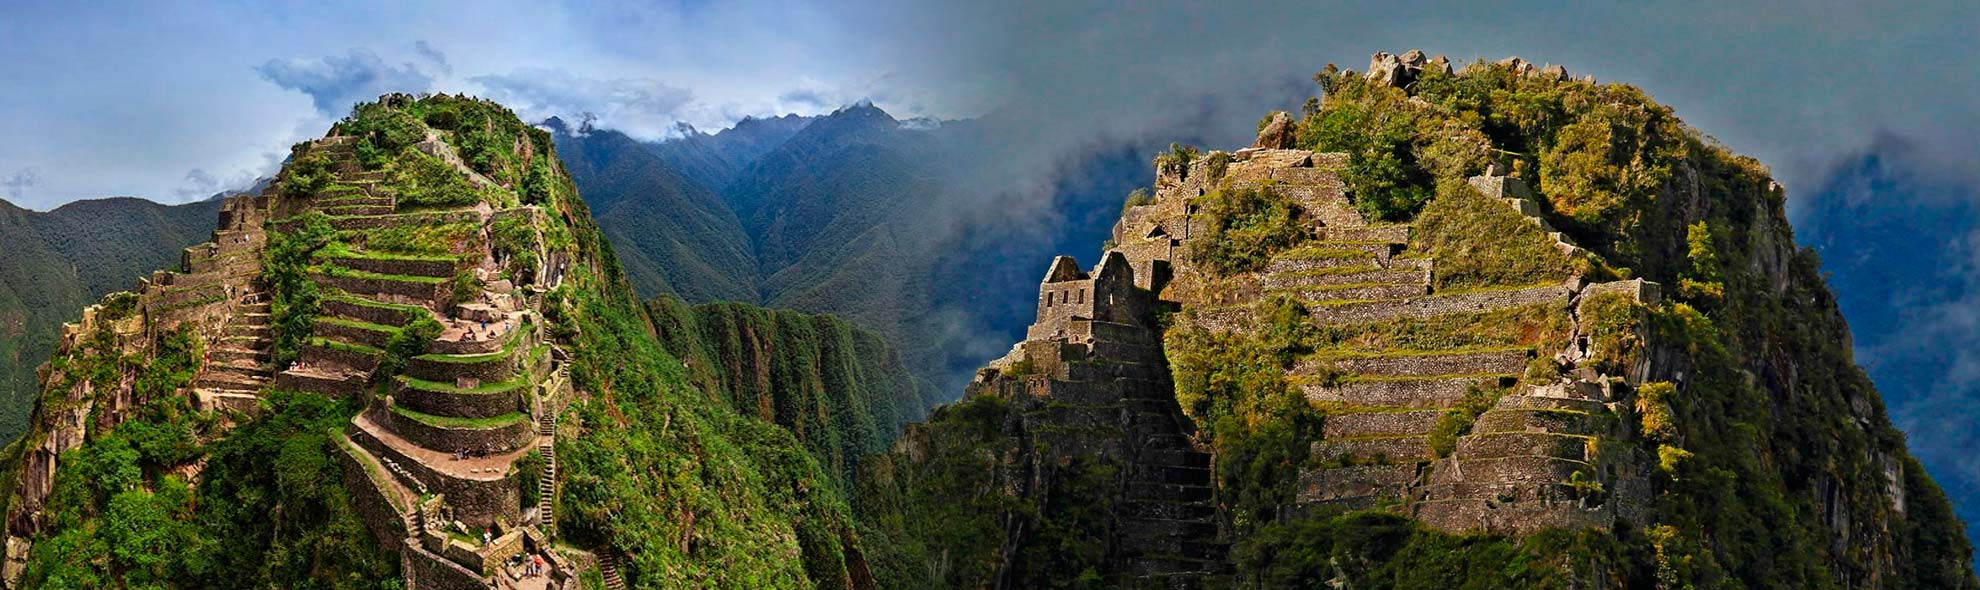 Huayna Picchu Permits